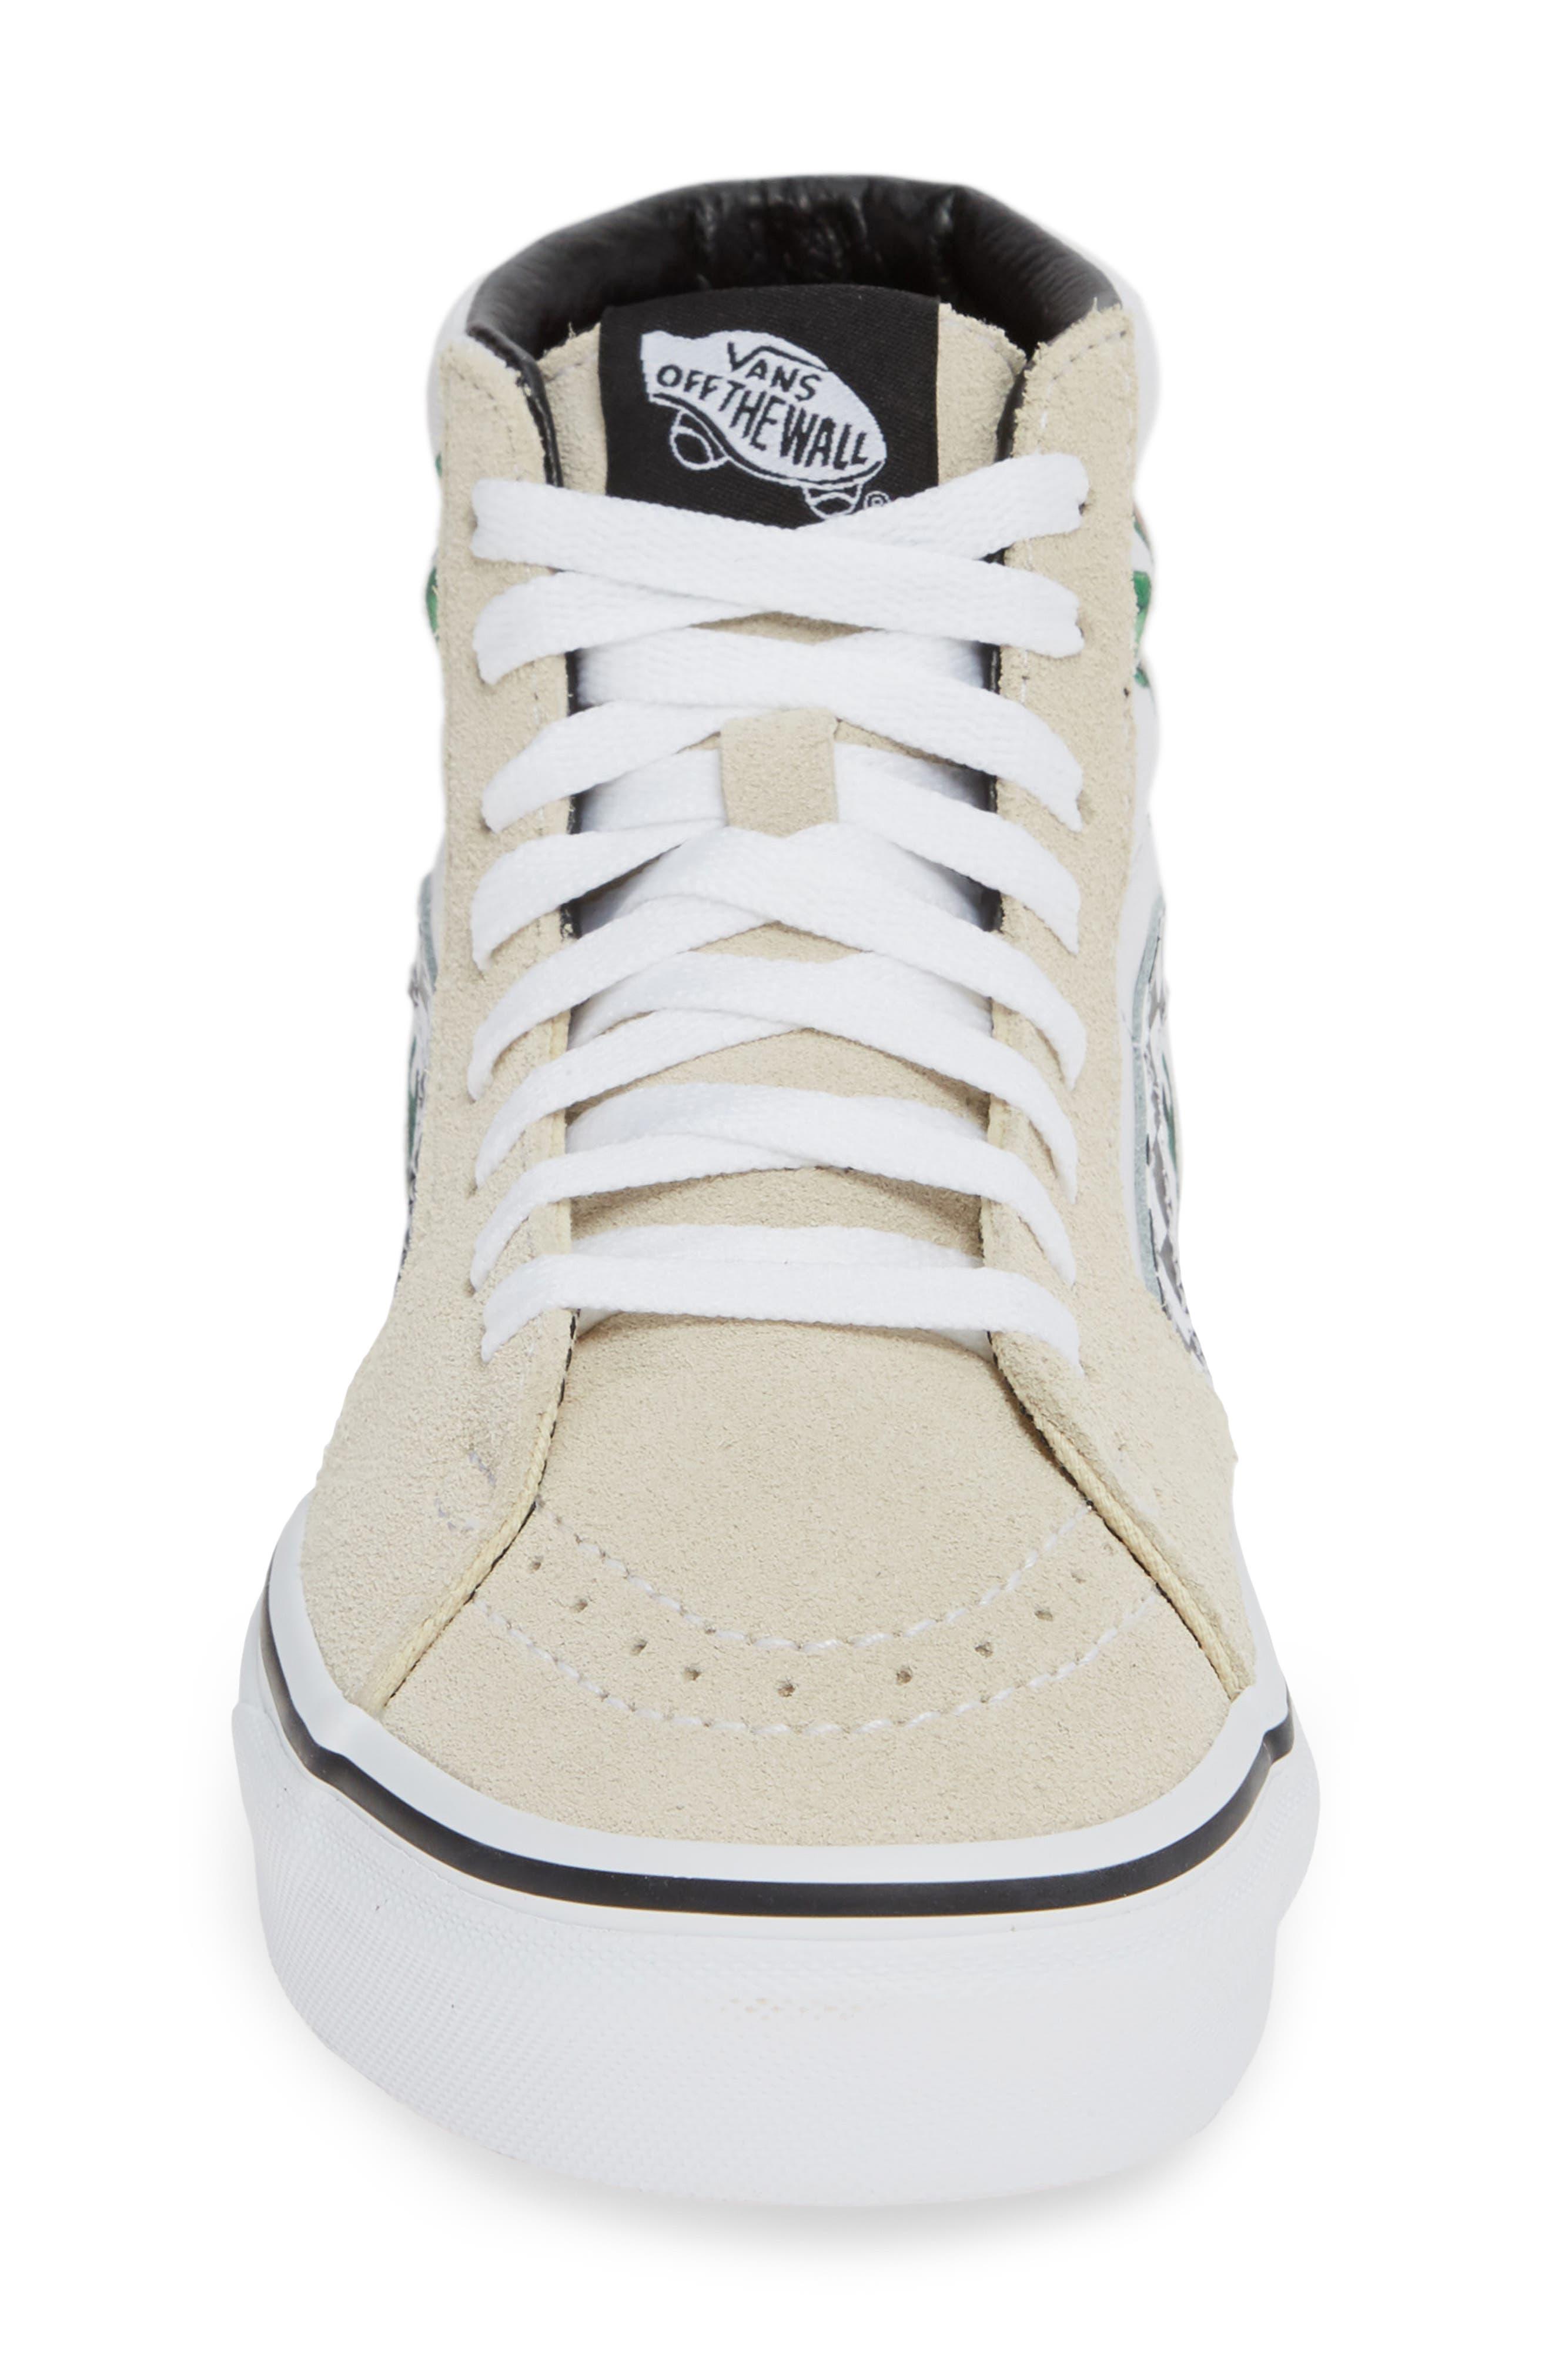 VANS,                             Sk8-Hi Checker Floral High Top Sneaker,                             Alternate thumbnail 4, color,                             CHECKER FLORAL TURTLEDOVE